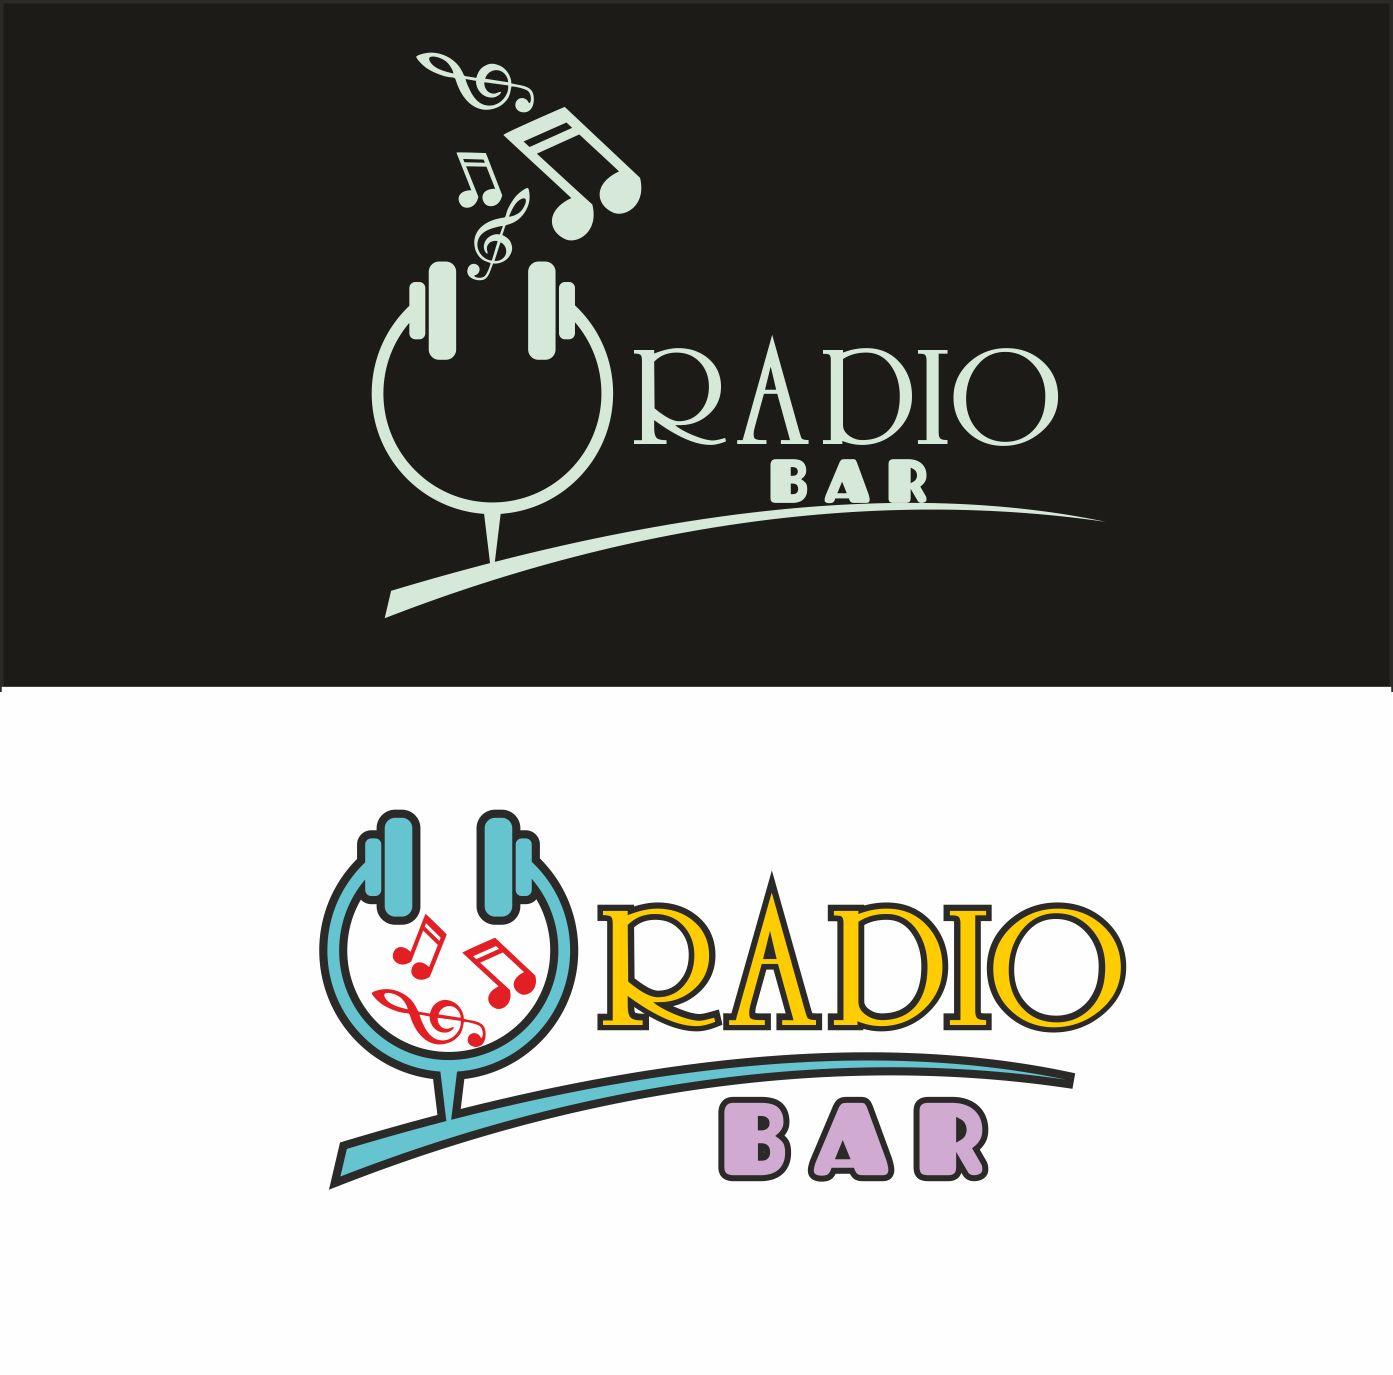 Логотип для Radio bar - дизайнер ilim1973